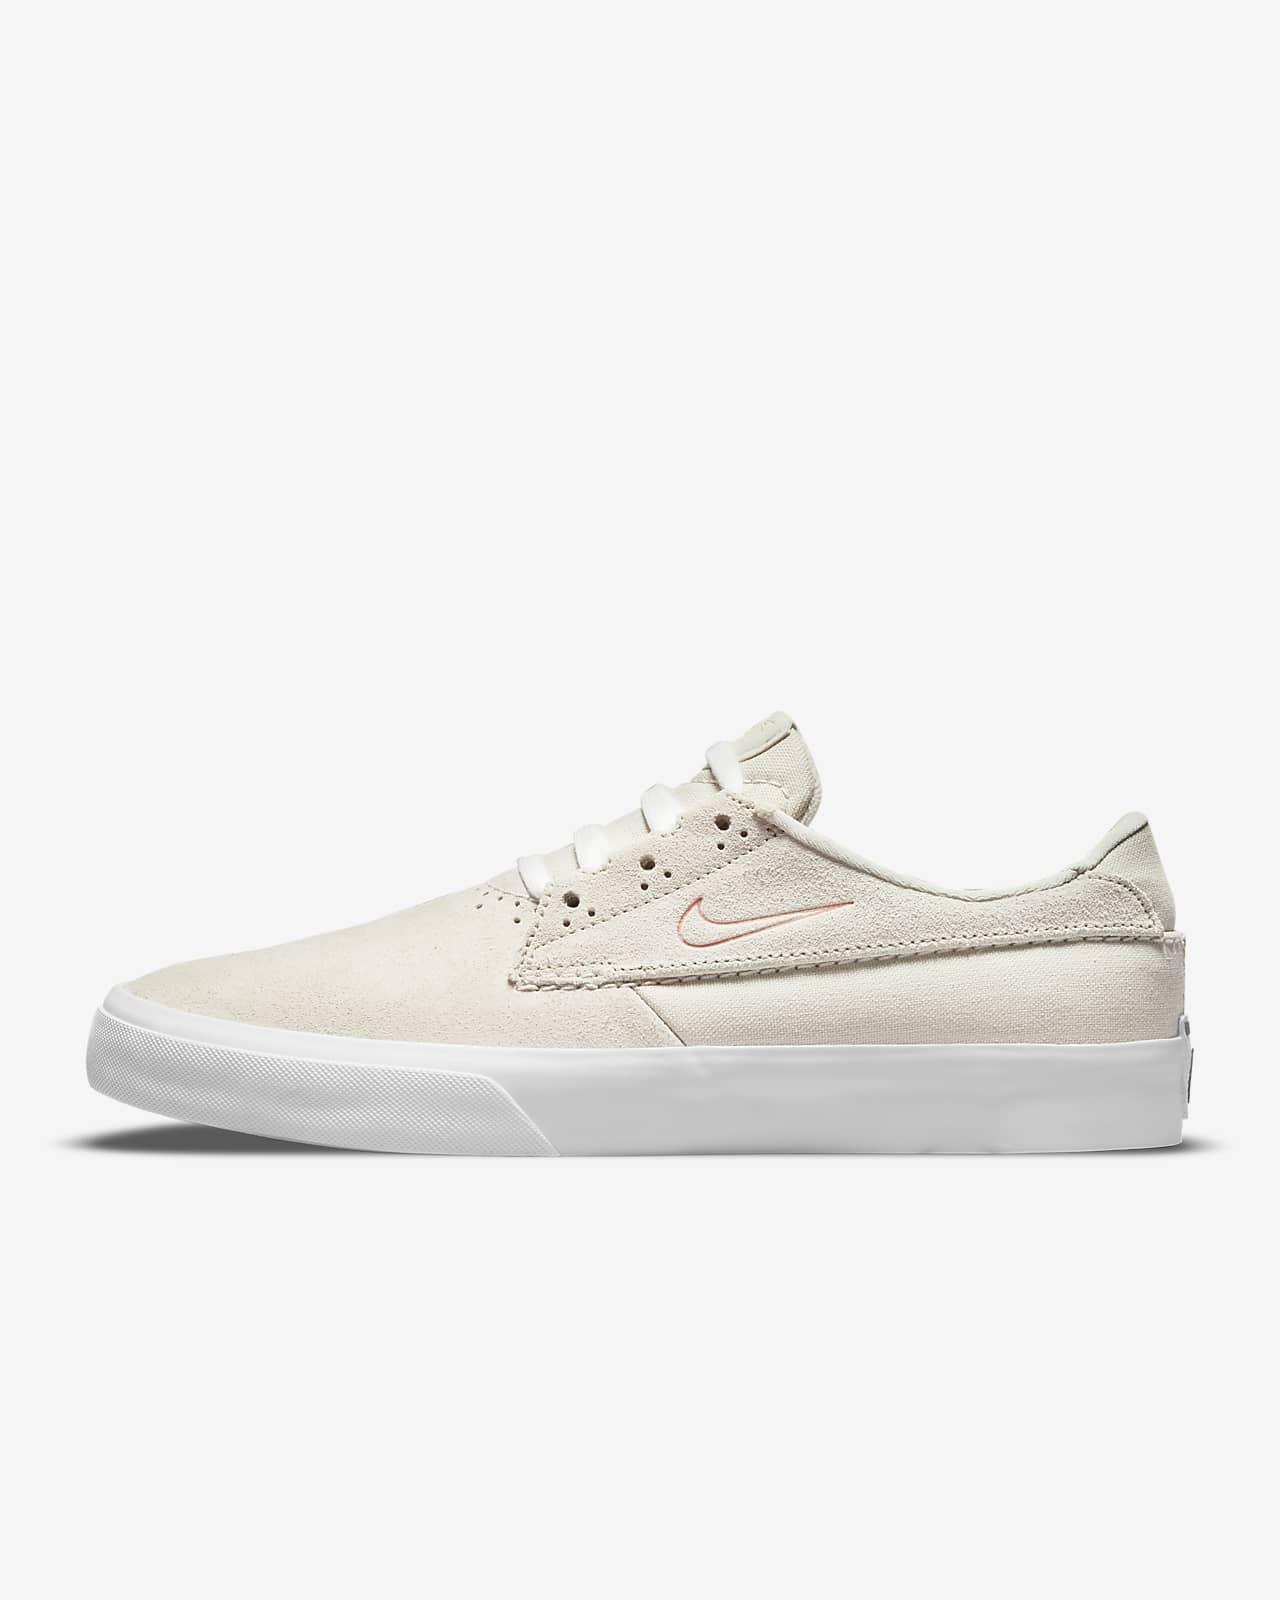 Chaussure de skateboard Nike SB Shane. Nike LU